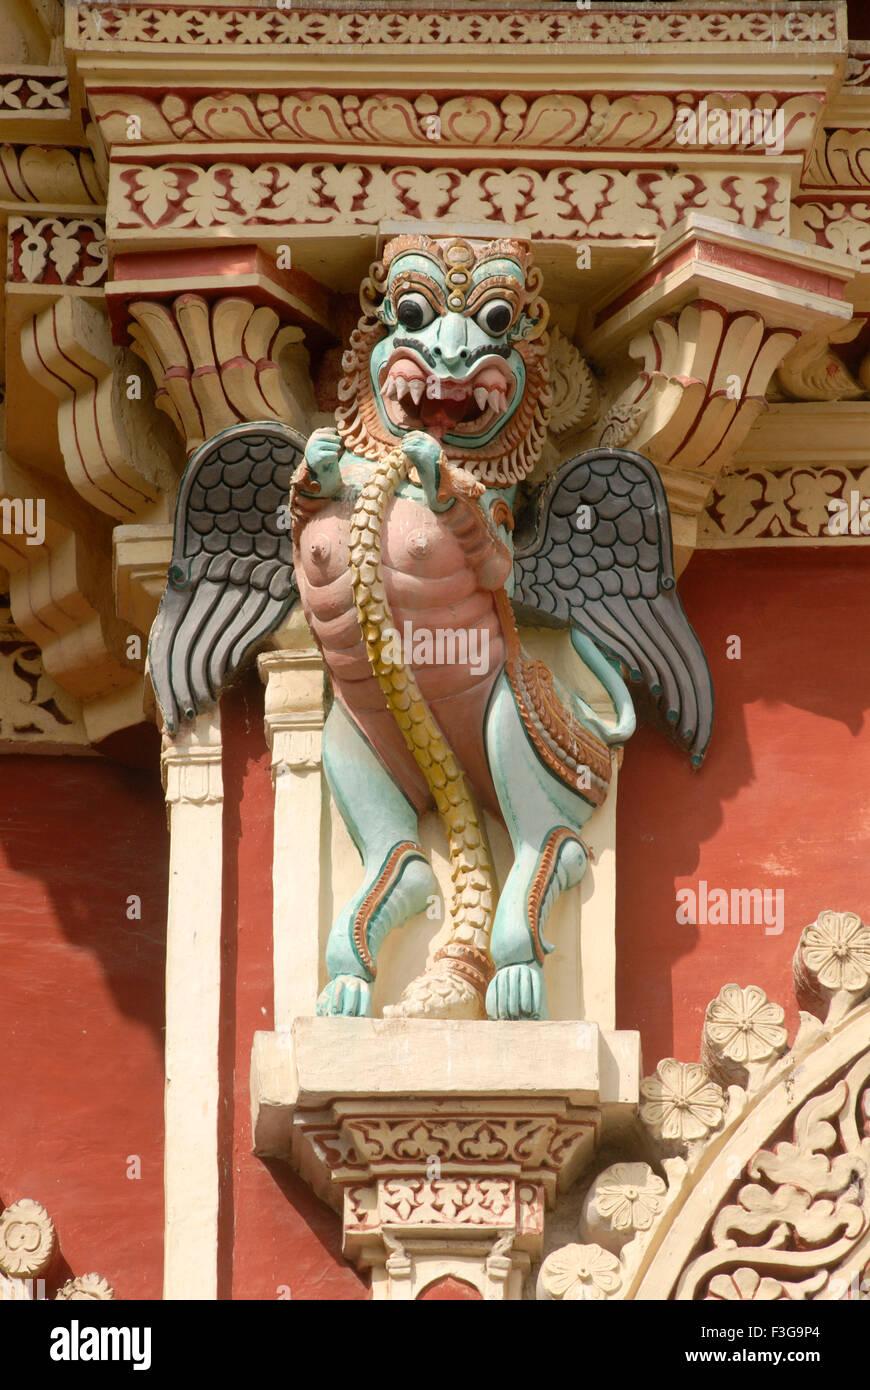 Close view of splendid stucco work at Thirumalai Nayak palace built in 1636 in the Indo Saracenic style at Madurai - Stock Image